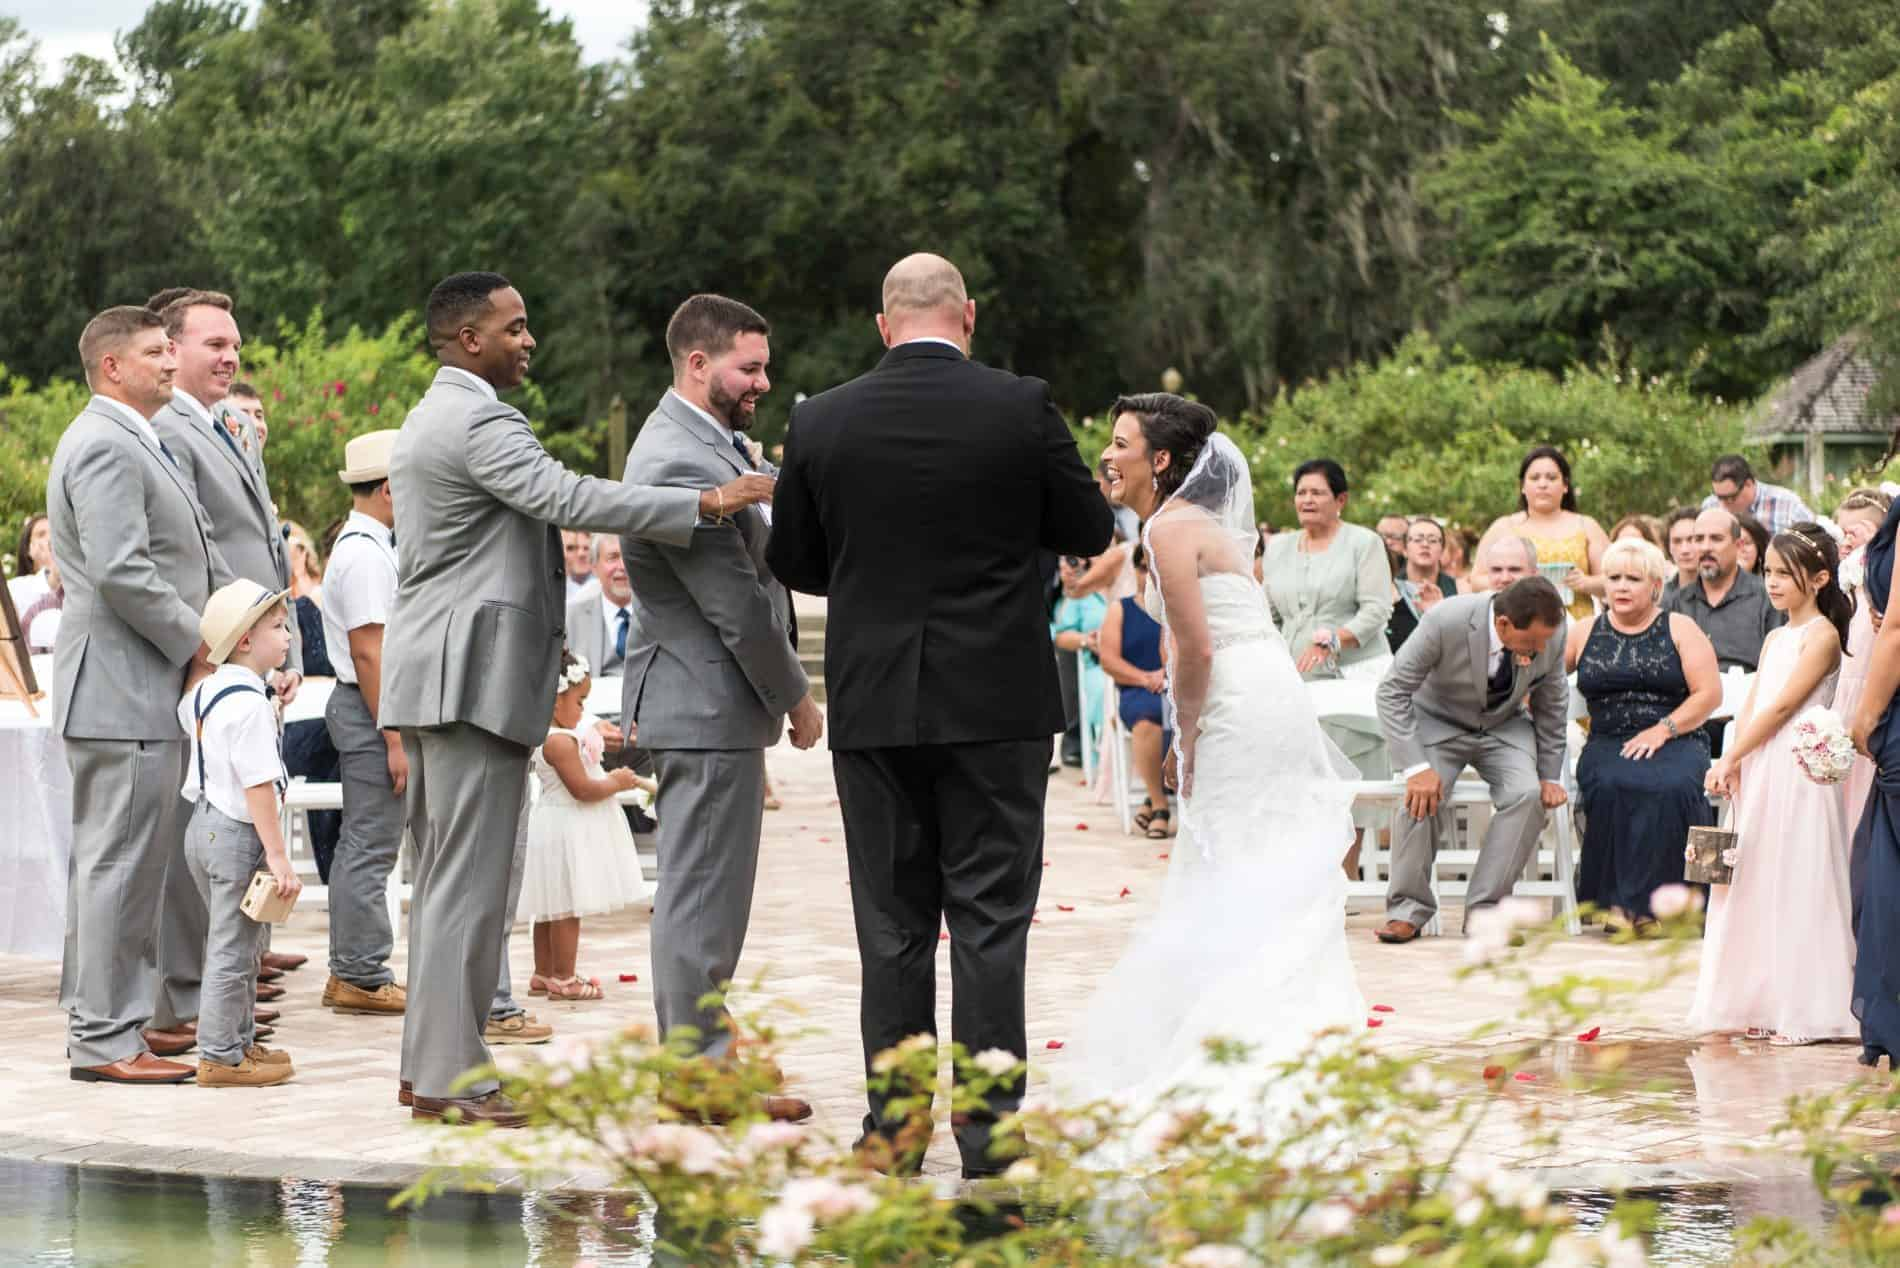 Having your Wedding outdoors